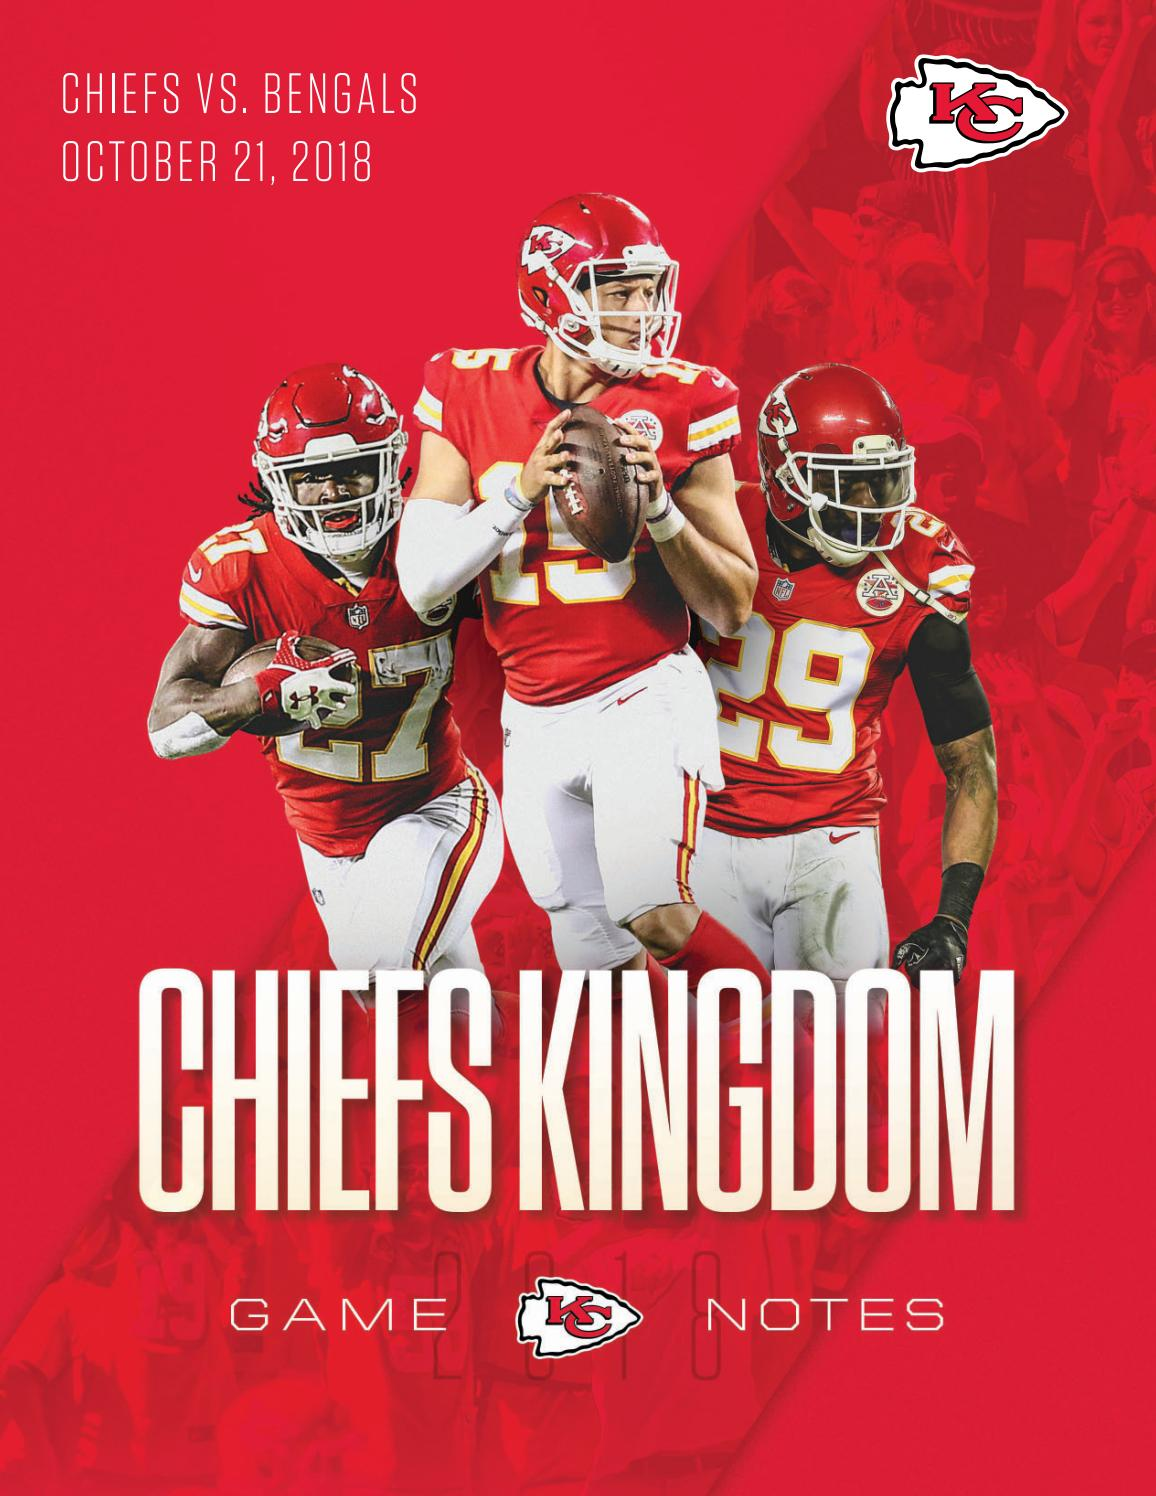 47ae6a0b95a Regular Season Game 7 - Chiefs vs. Bengals (10-21-18) by Kansas City Chiefs  - issuu